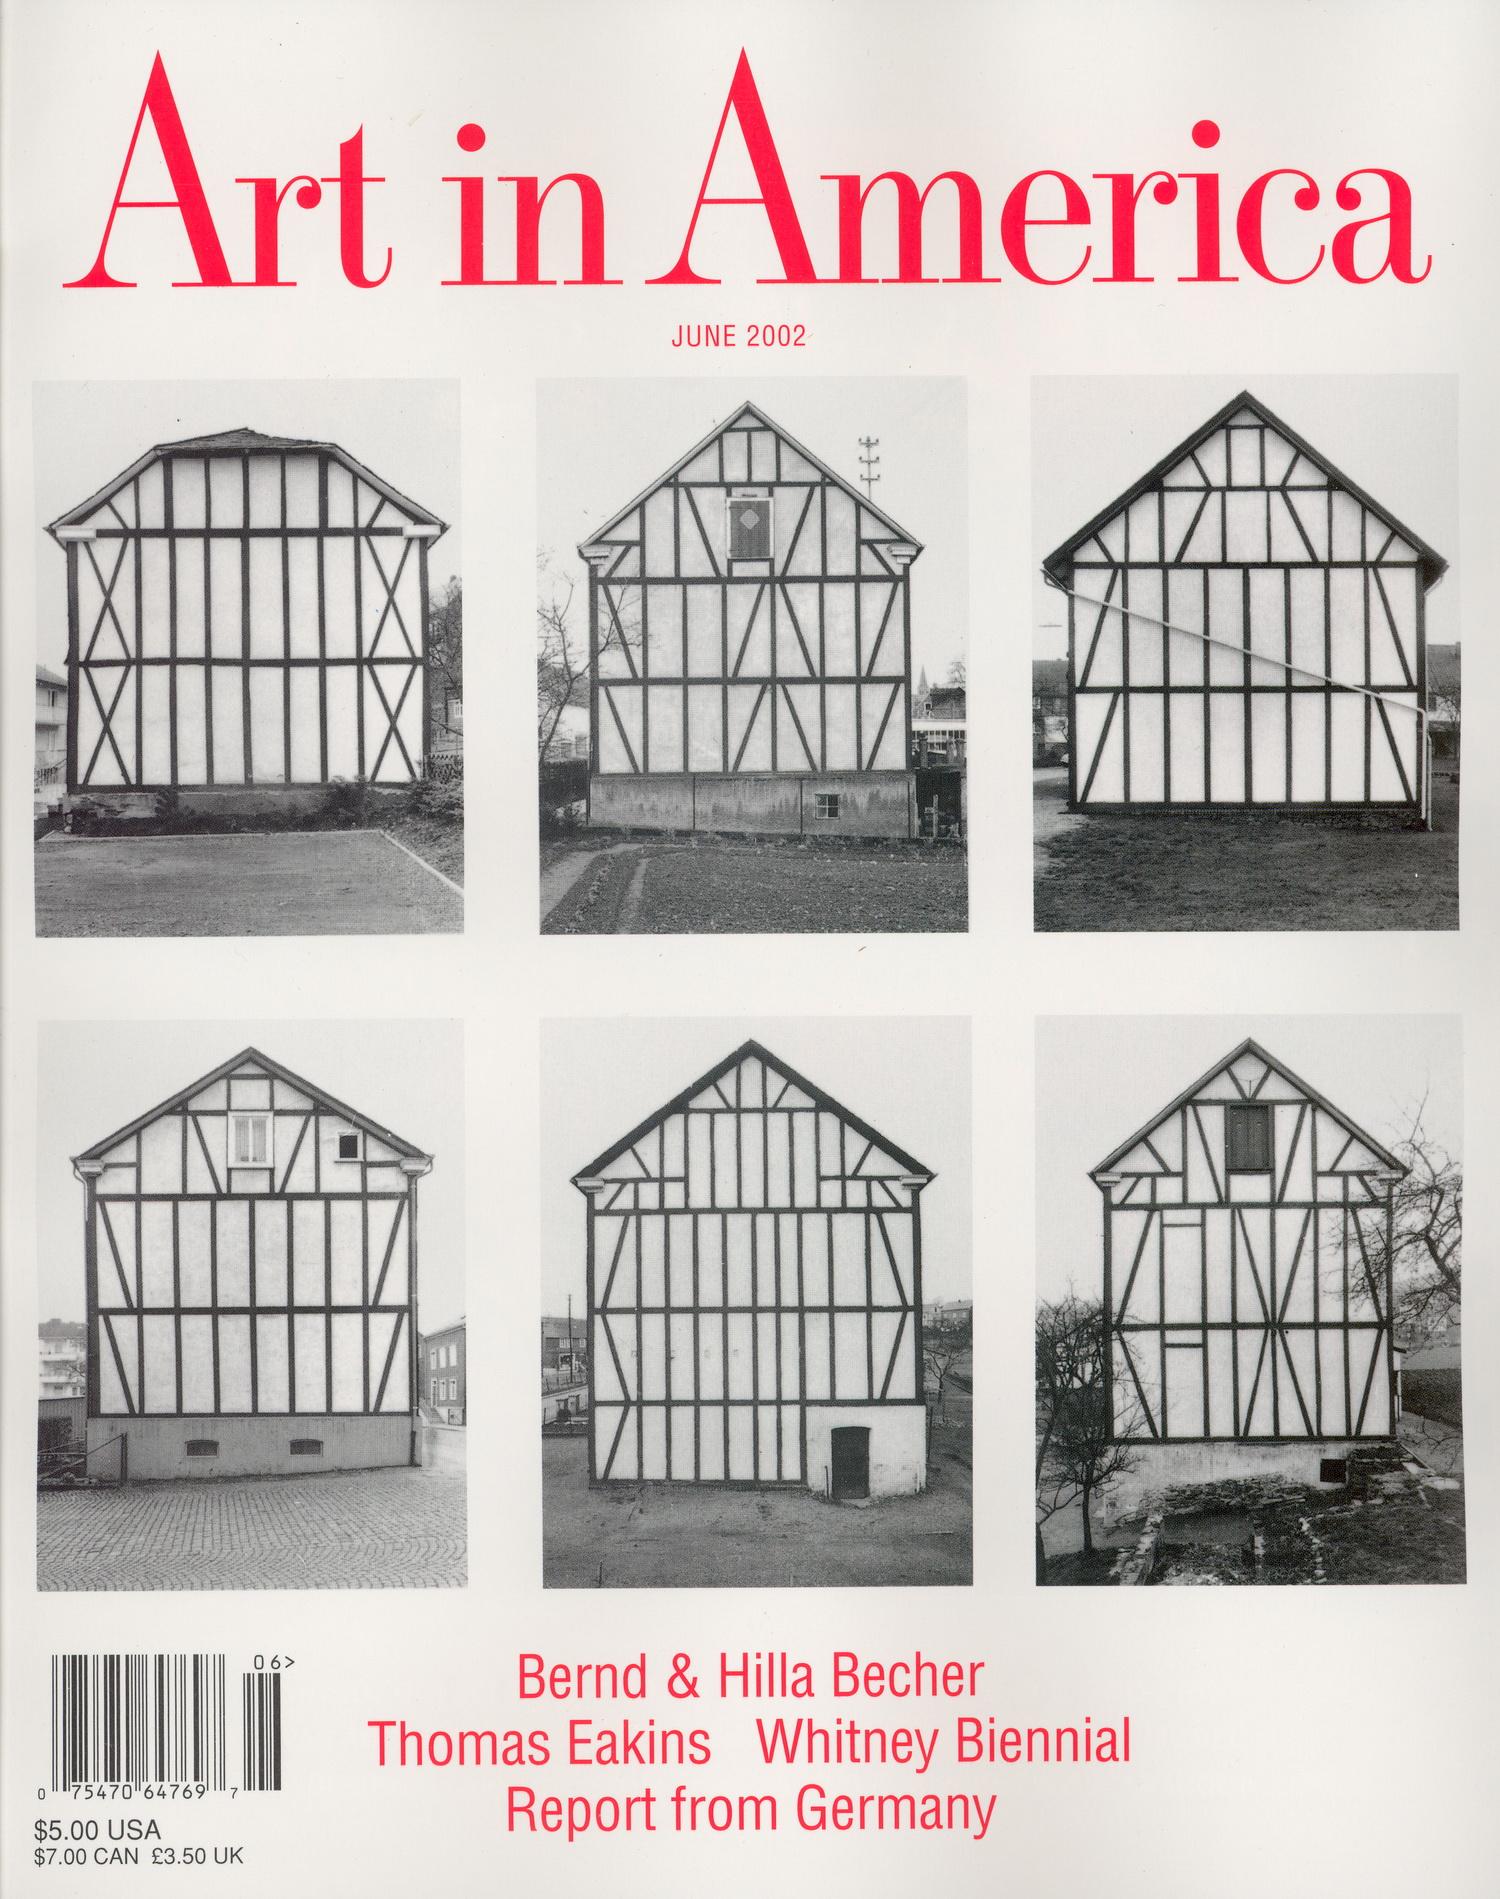 Art in America Cover.jpg